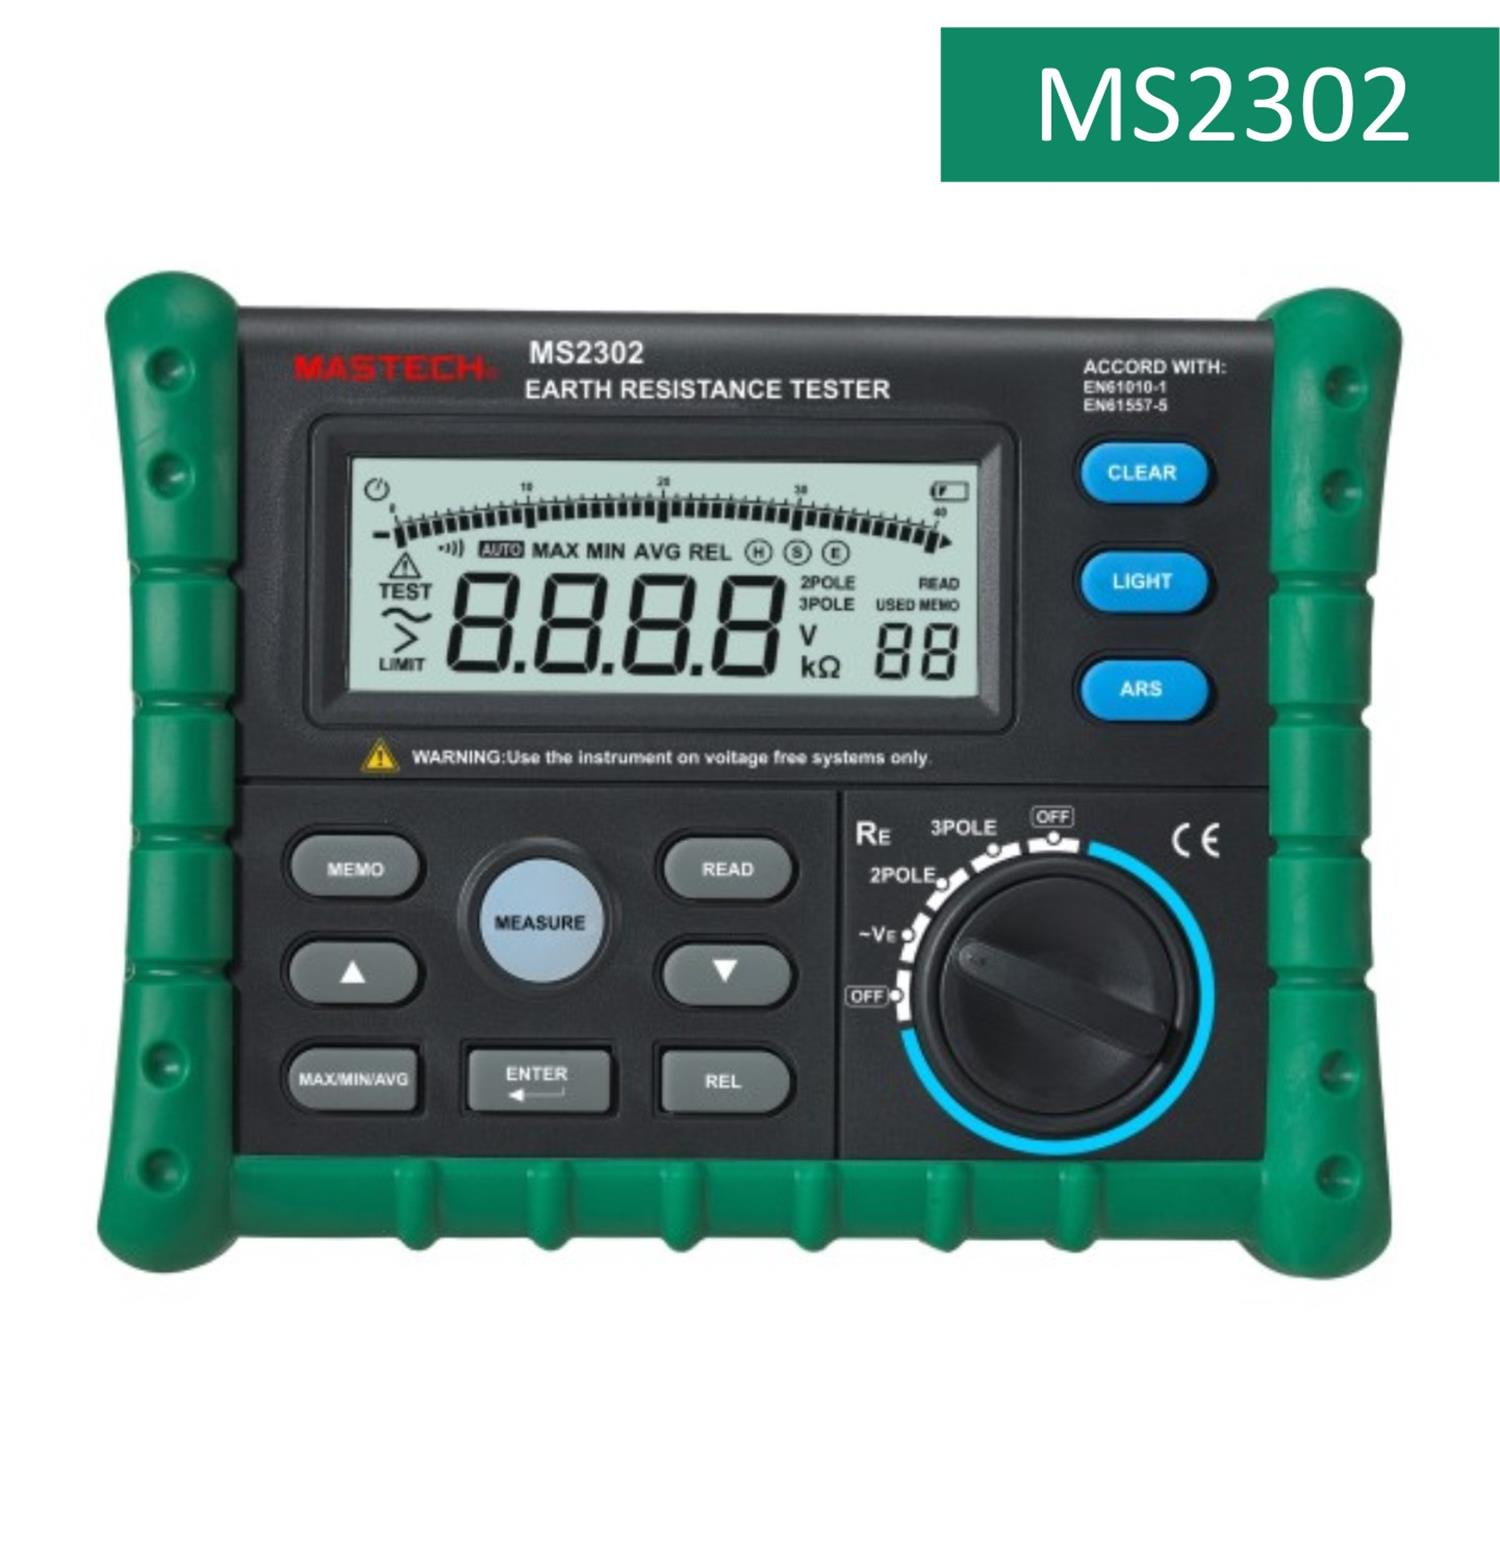 MS2302